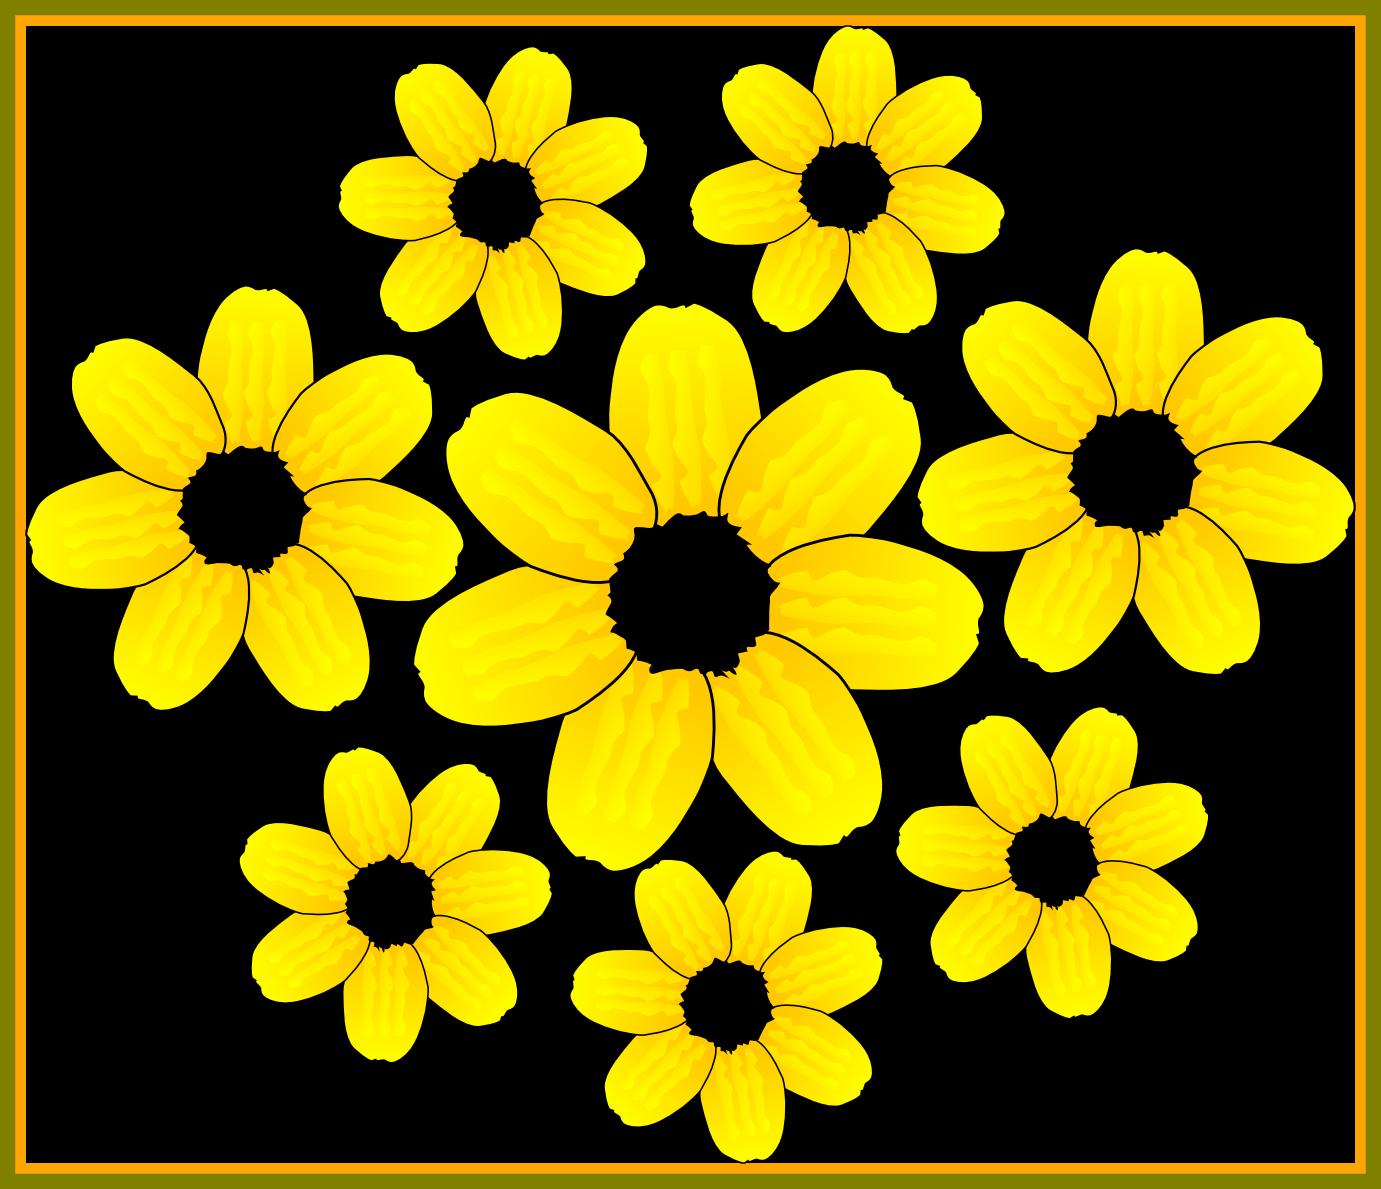 Garden clipart sunflower. Unbelievable flower accents graphics